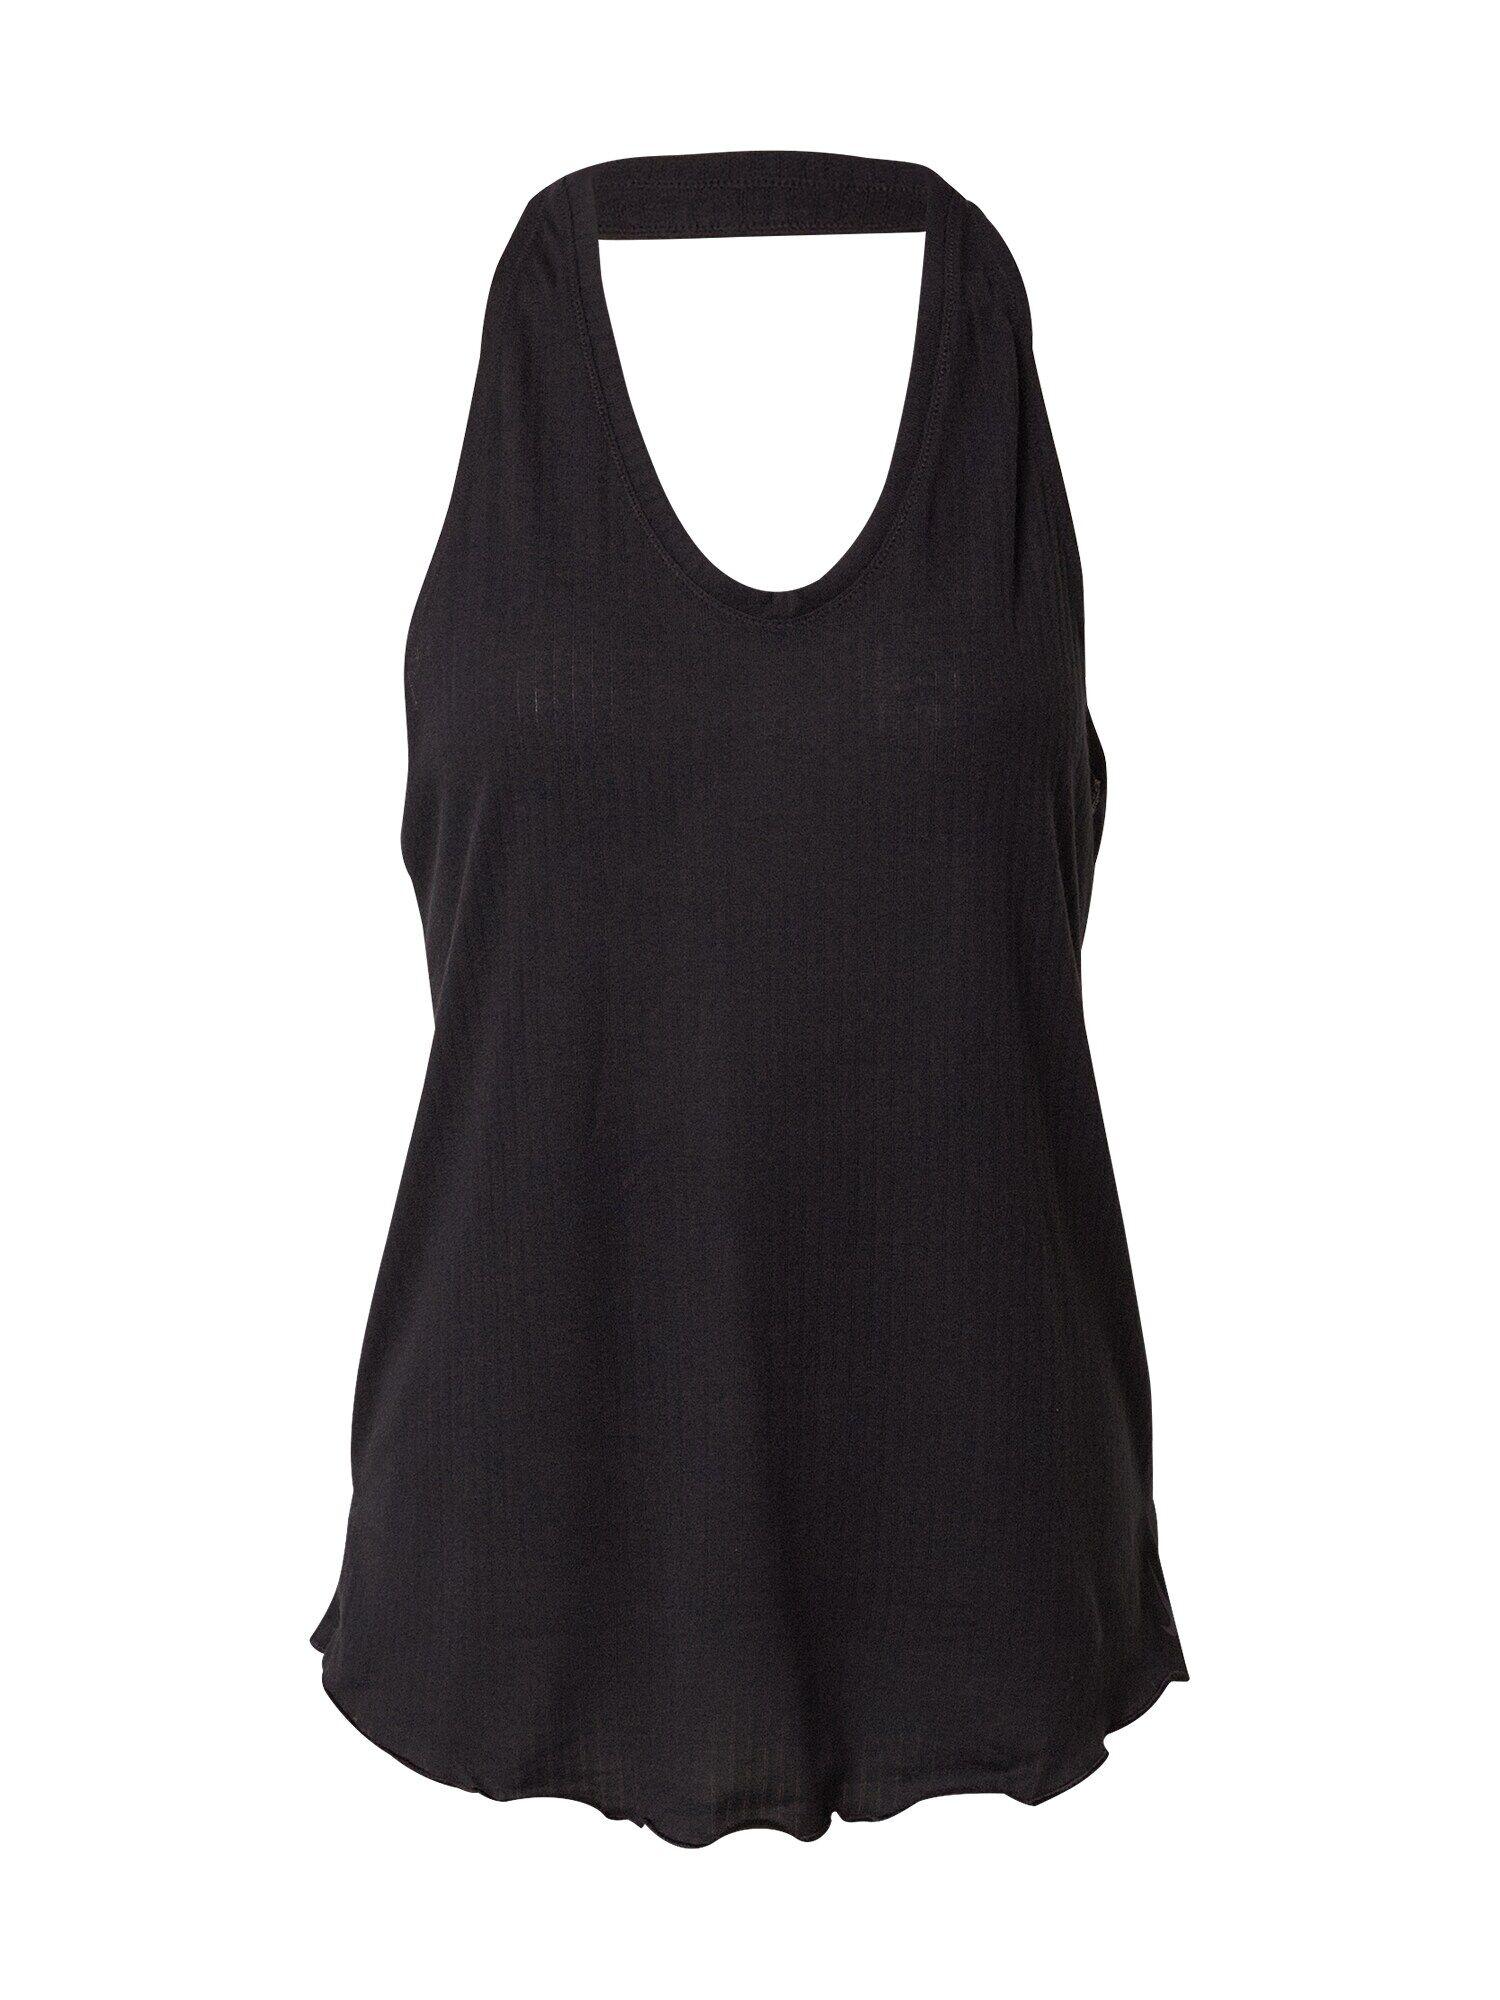 NIKE Haut de sport  - Noir - Taille: XS - female